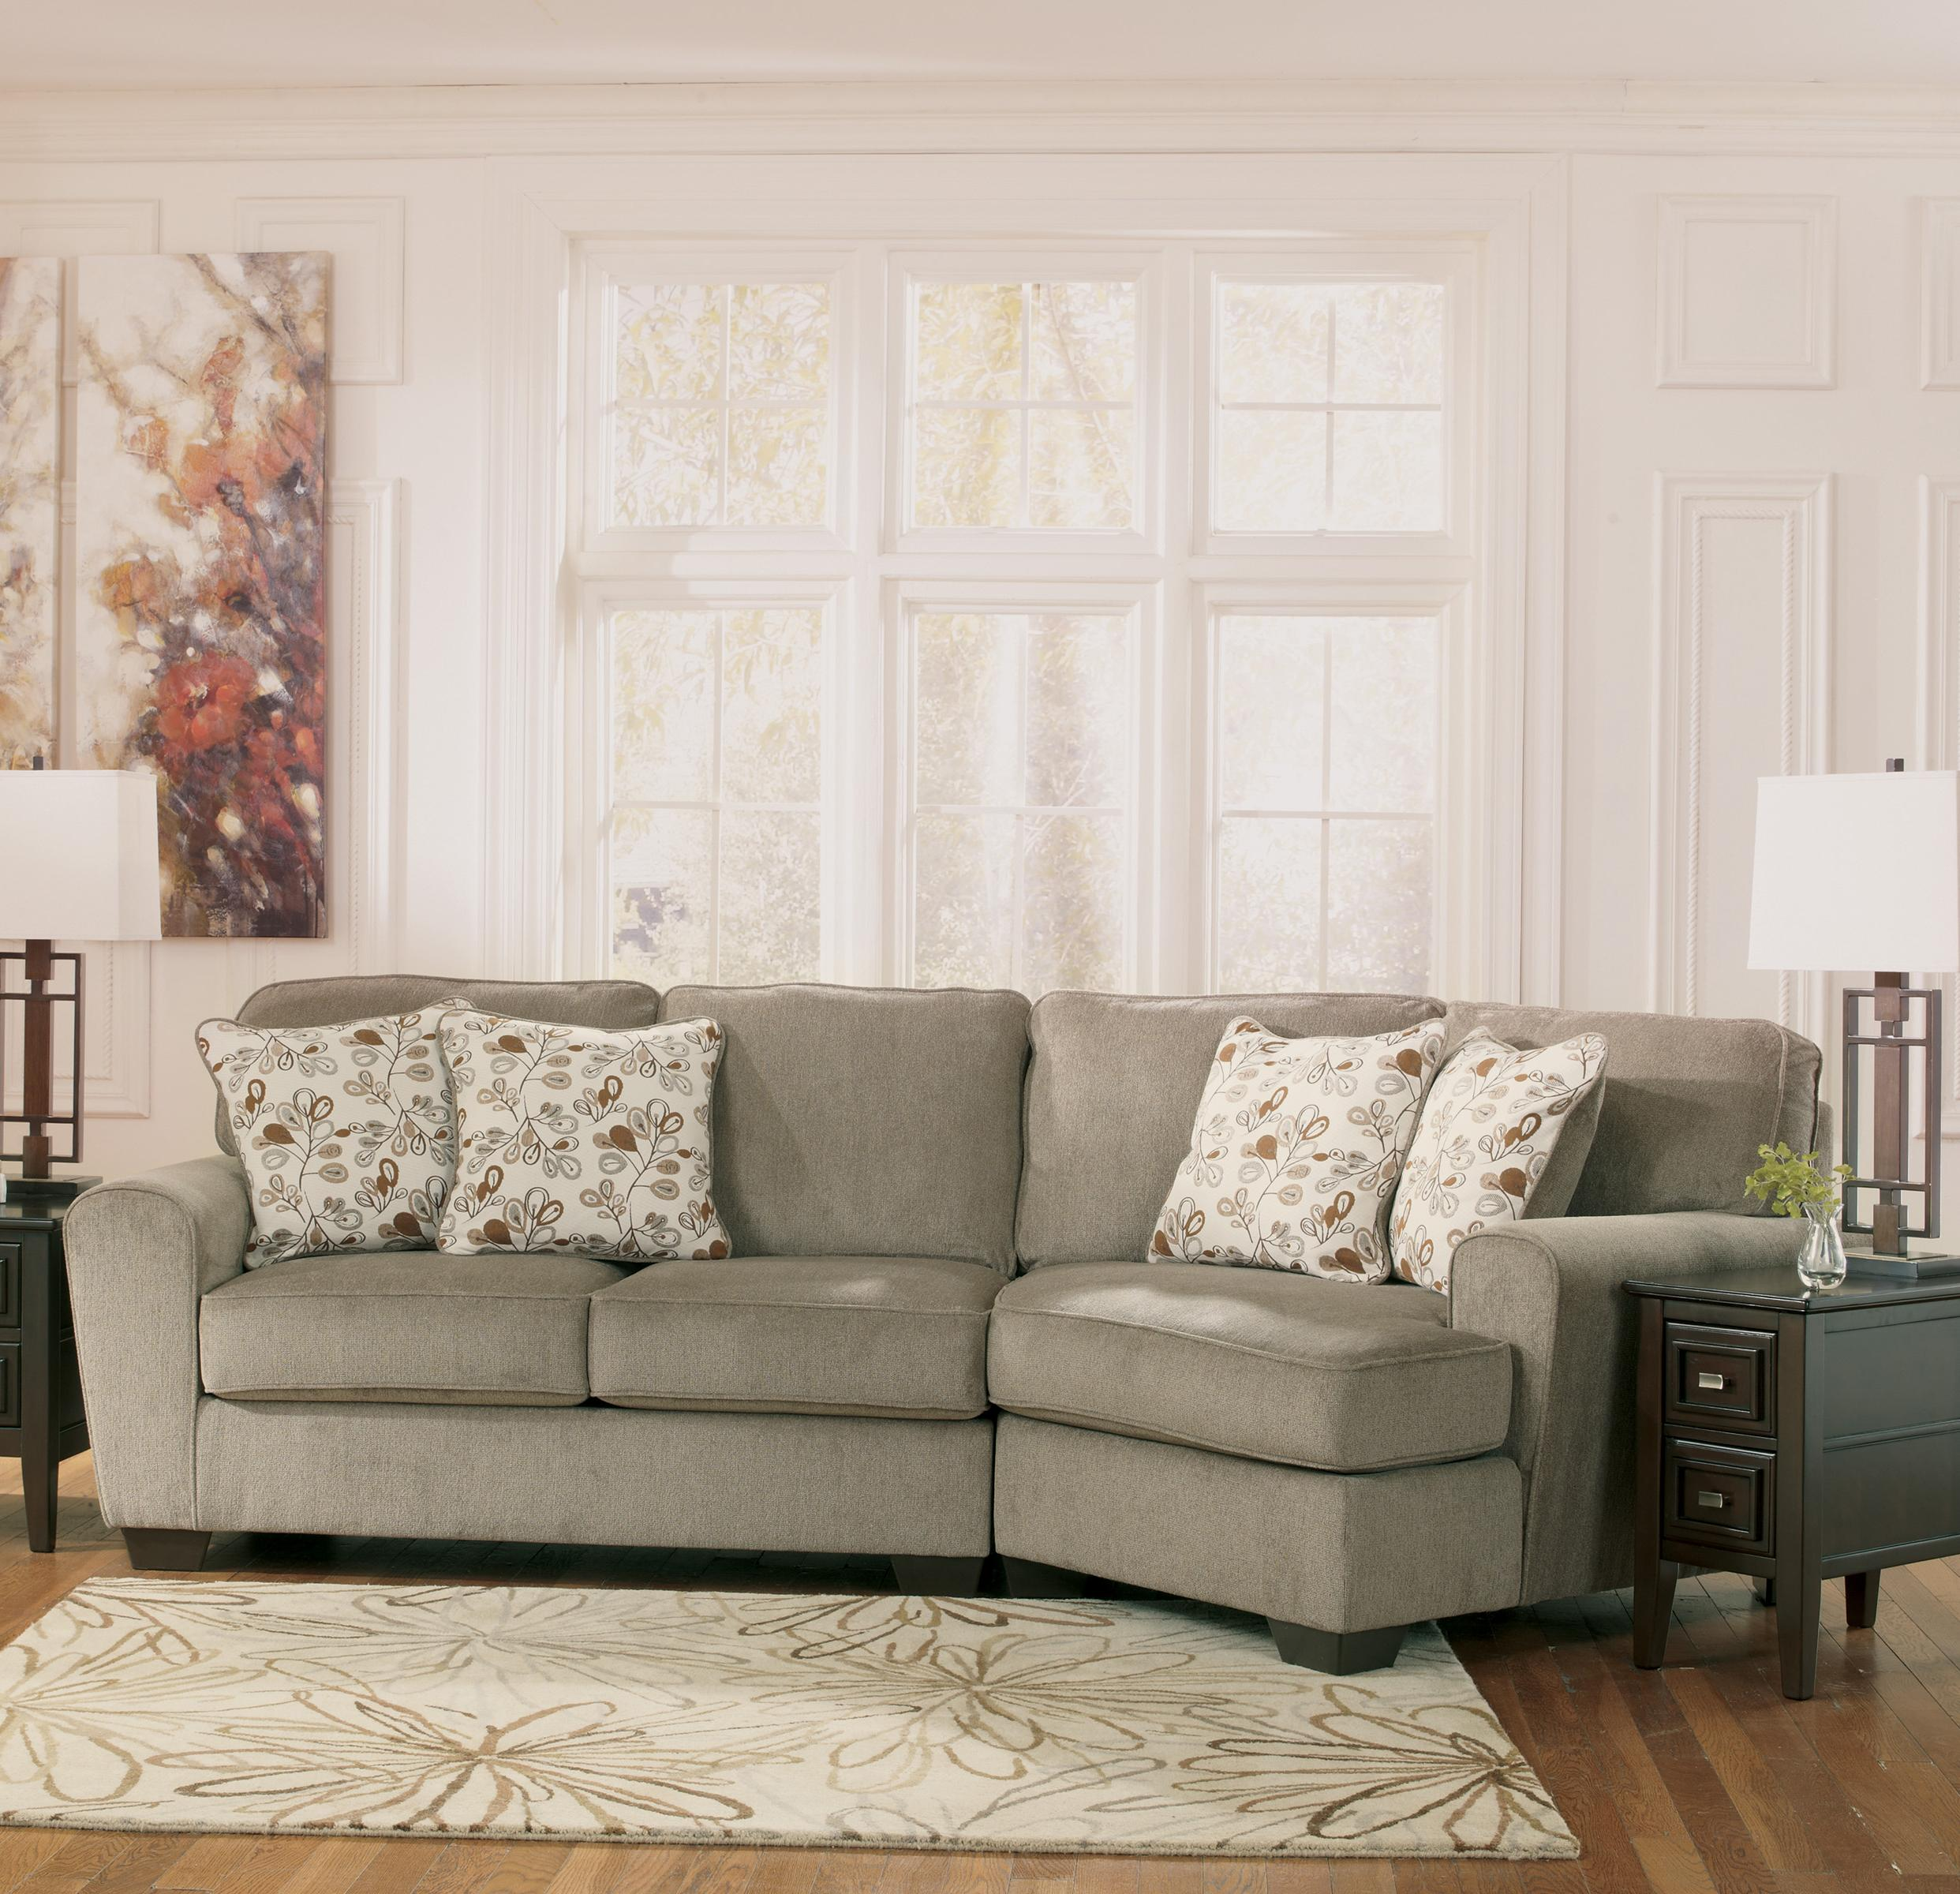 Ashley Furniture Patola Park Patina 2 Piece Sectional